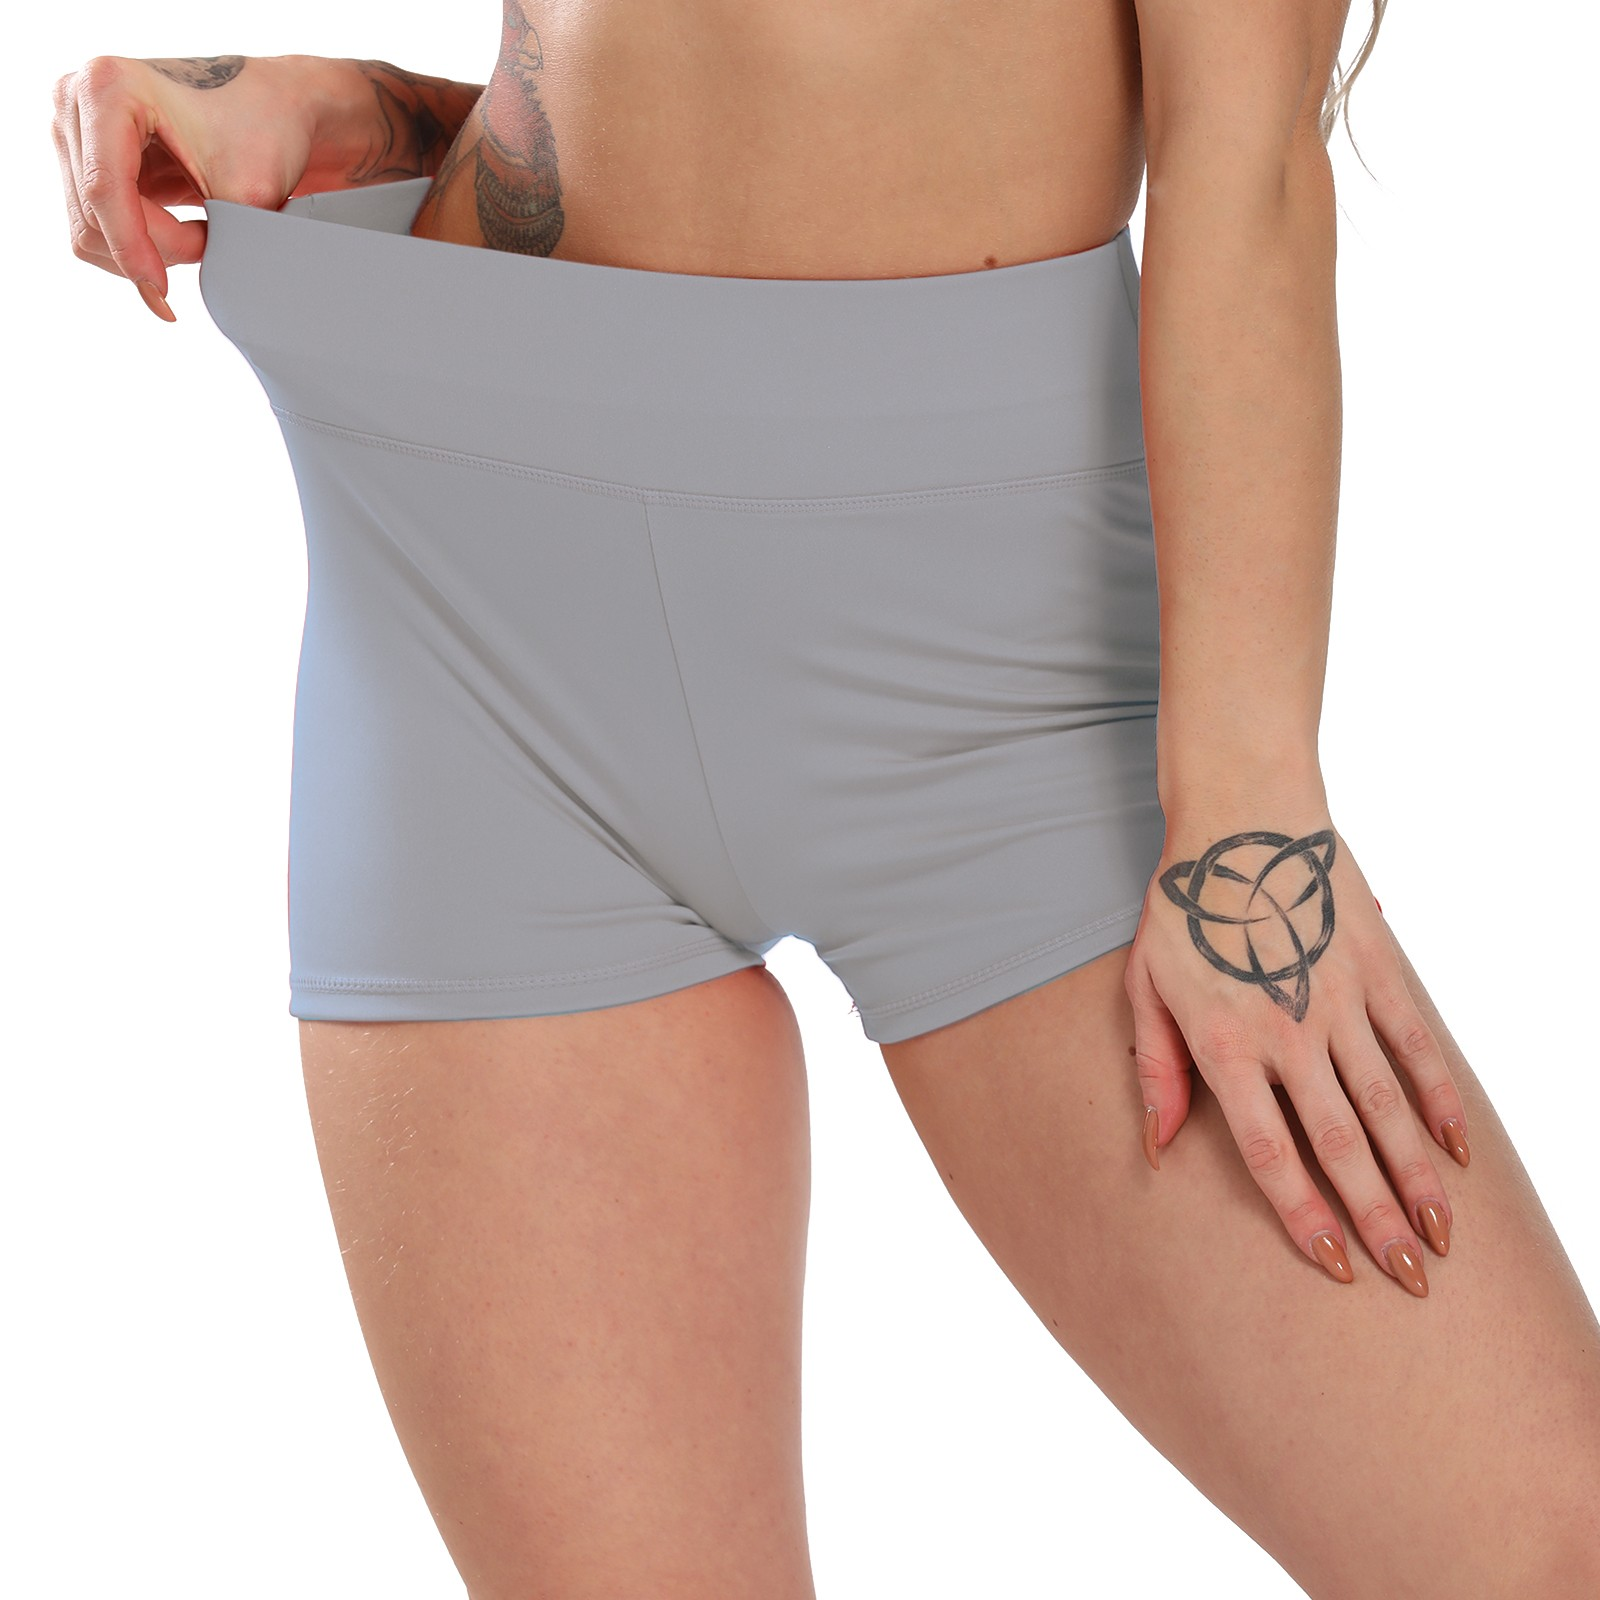 Blue S VIccoo Shorts Women High Waist Stretch Workout Shorts Butt Lift Stripes Yoga Shaping Pants